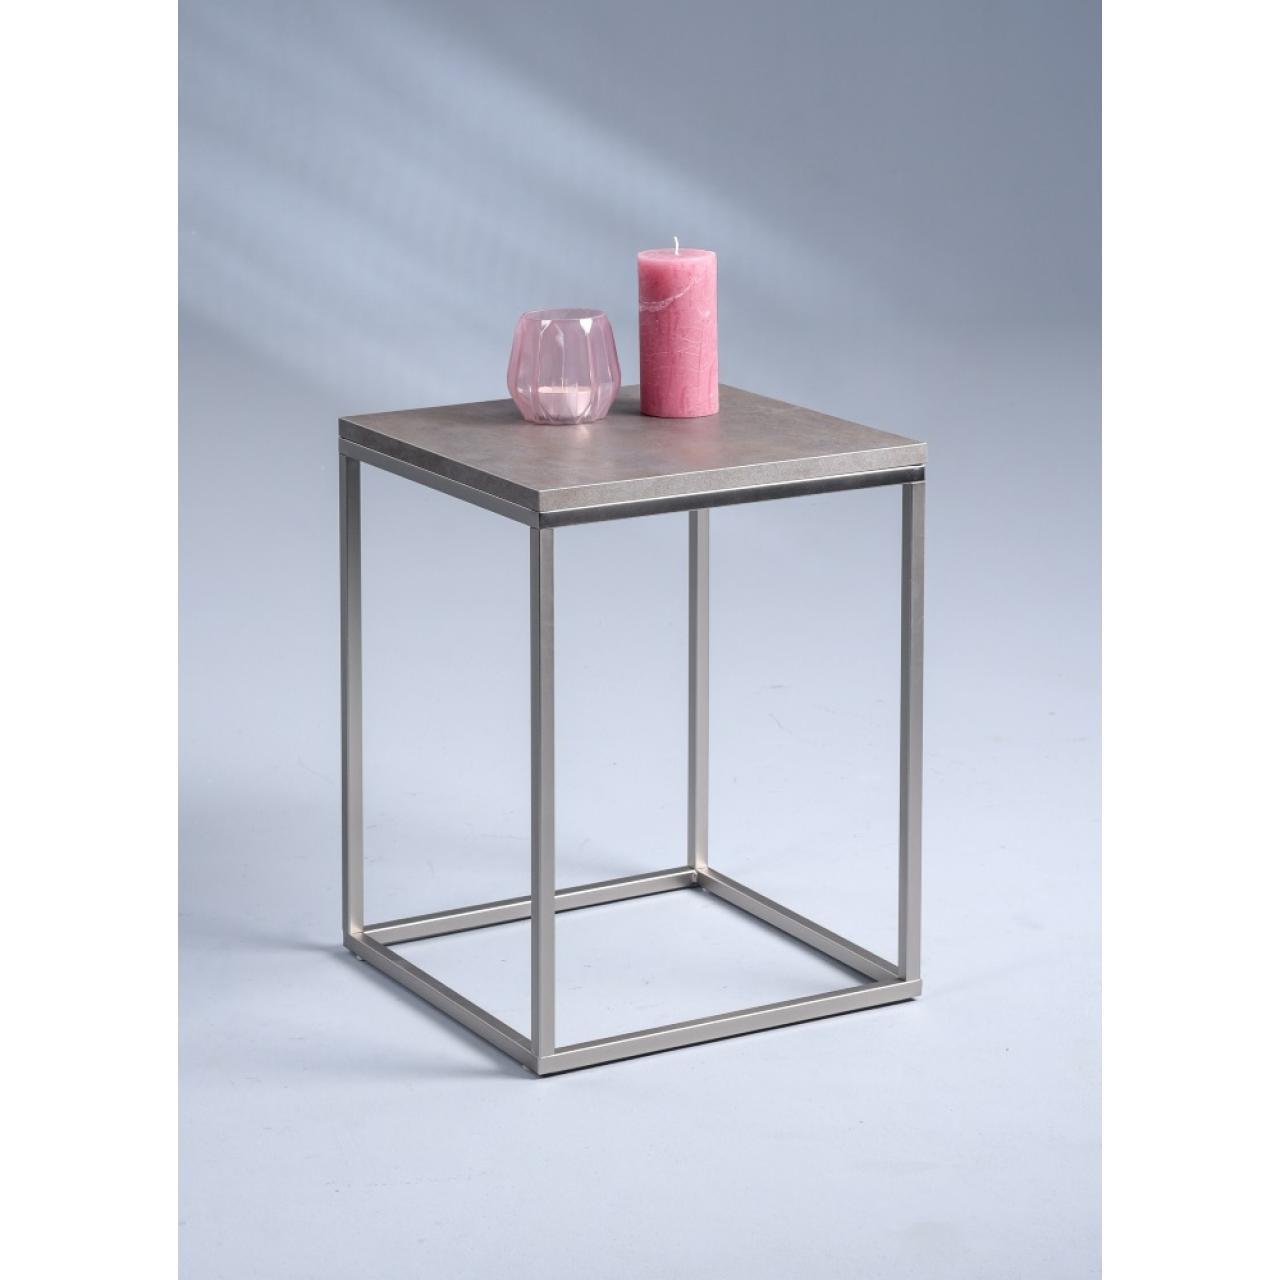 Beistelltisch Scala Keramik-/Edelstahloptik MDF Metall 40x40 cm